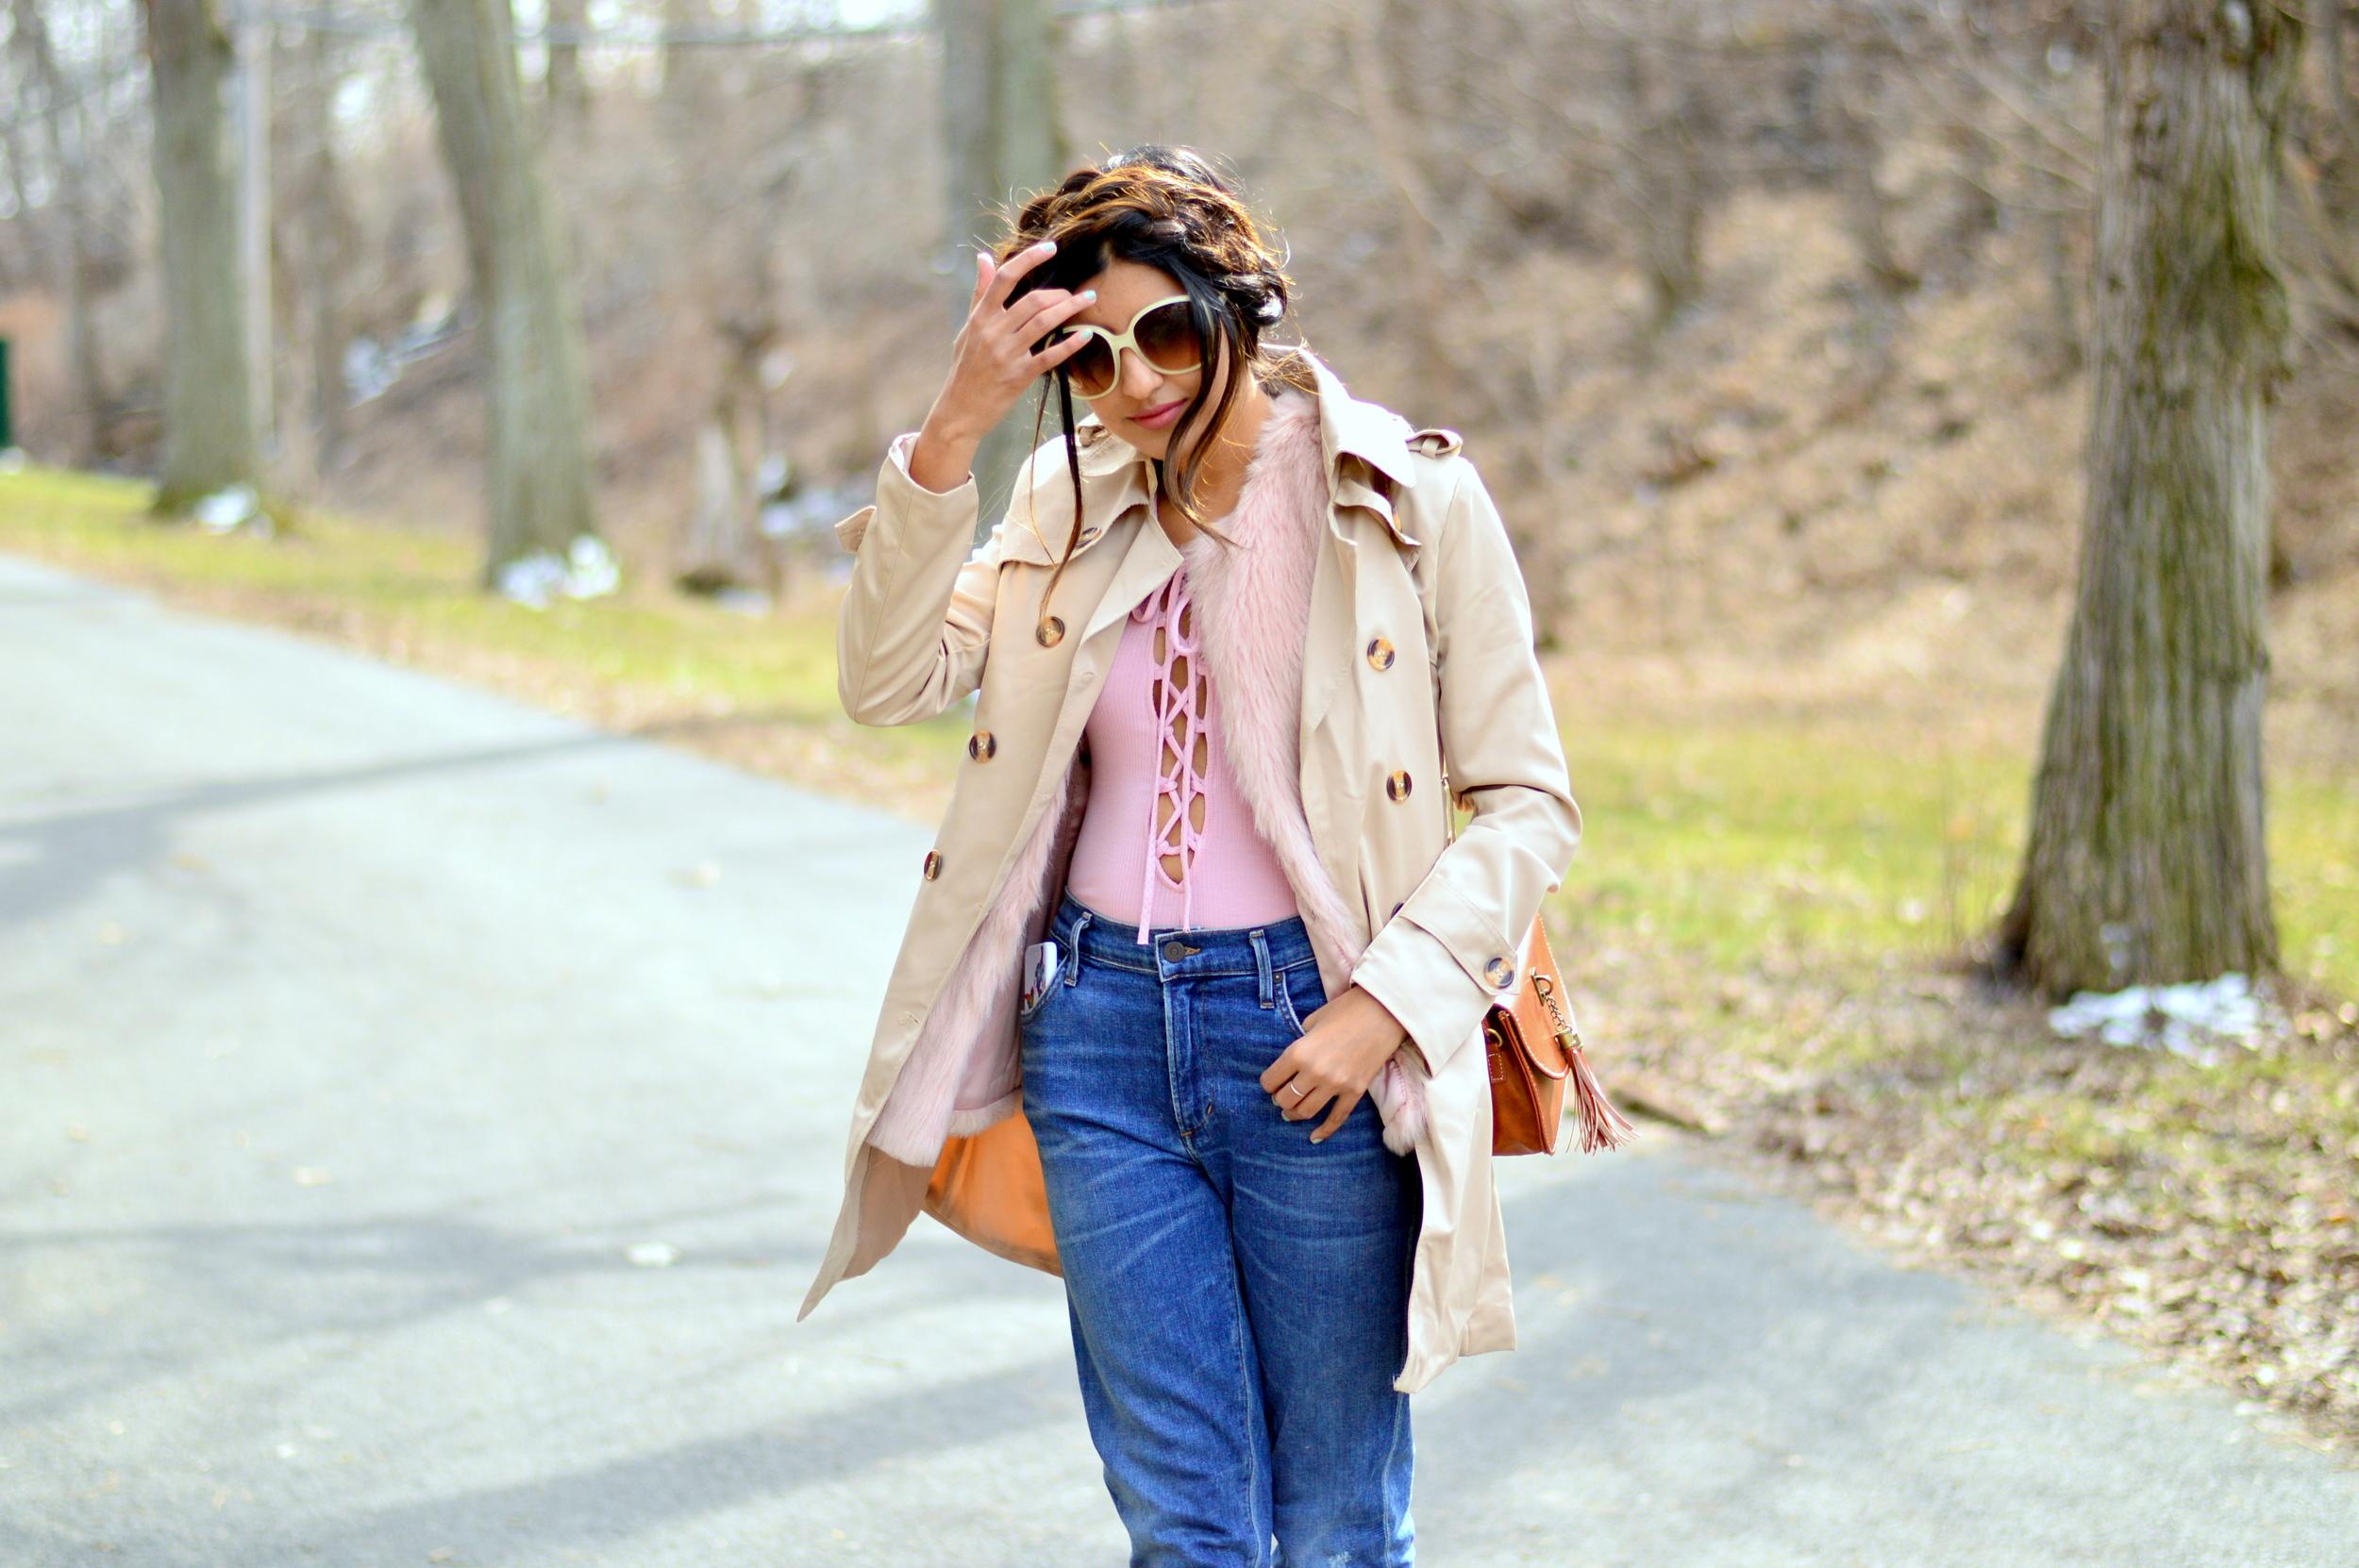 lace-up-pink-bodysuit-transition-style 2